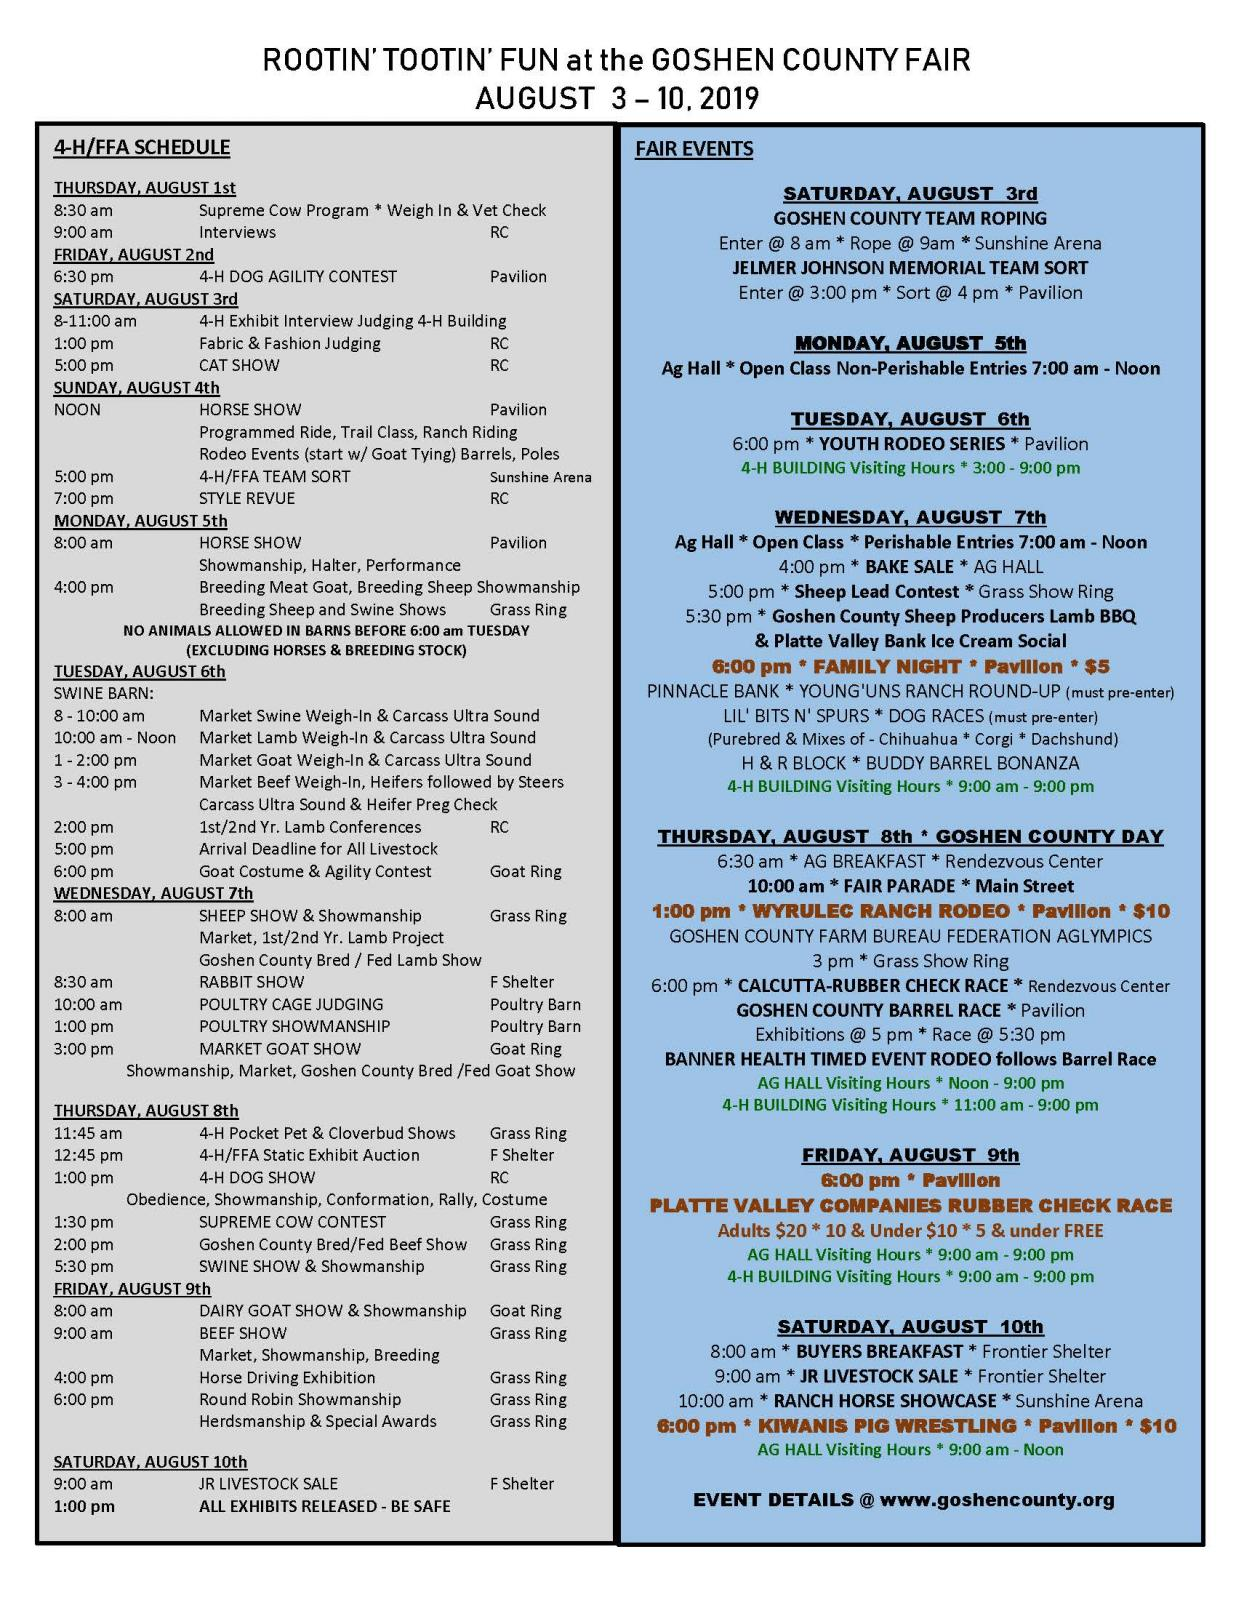 2019 Goshen County Fair Schedule Photo